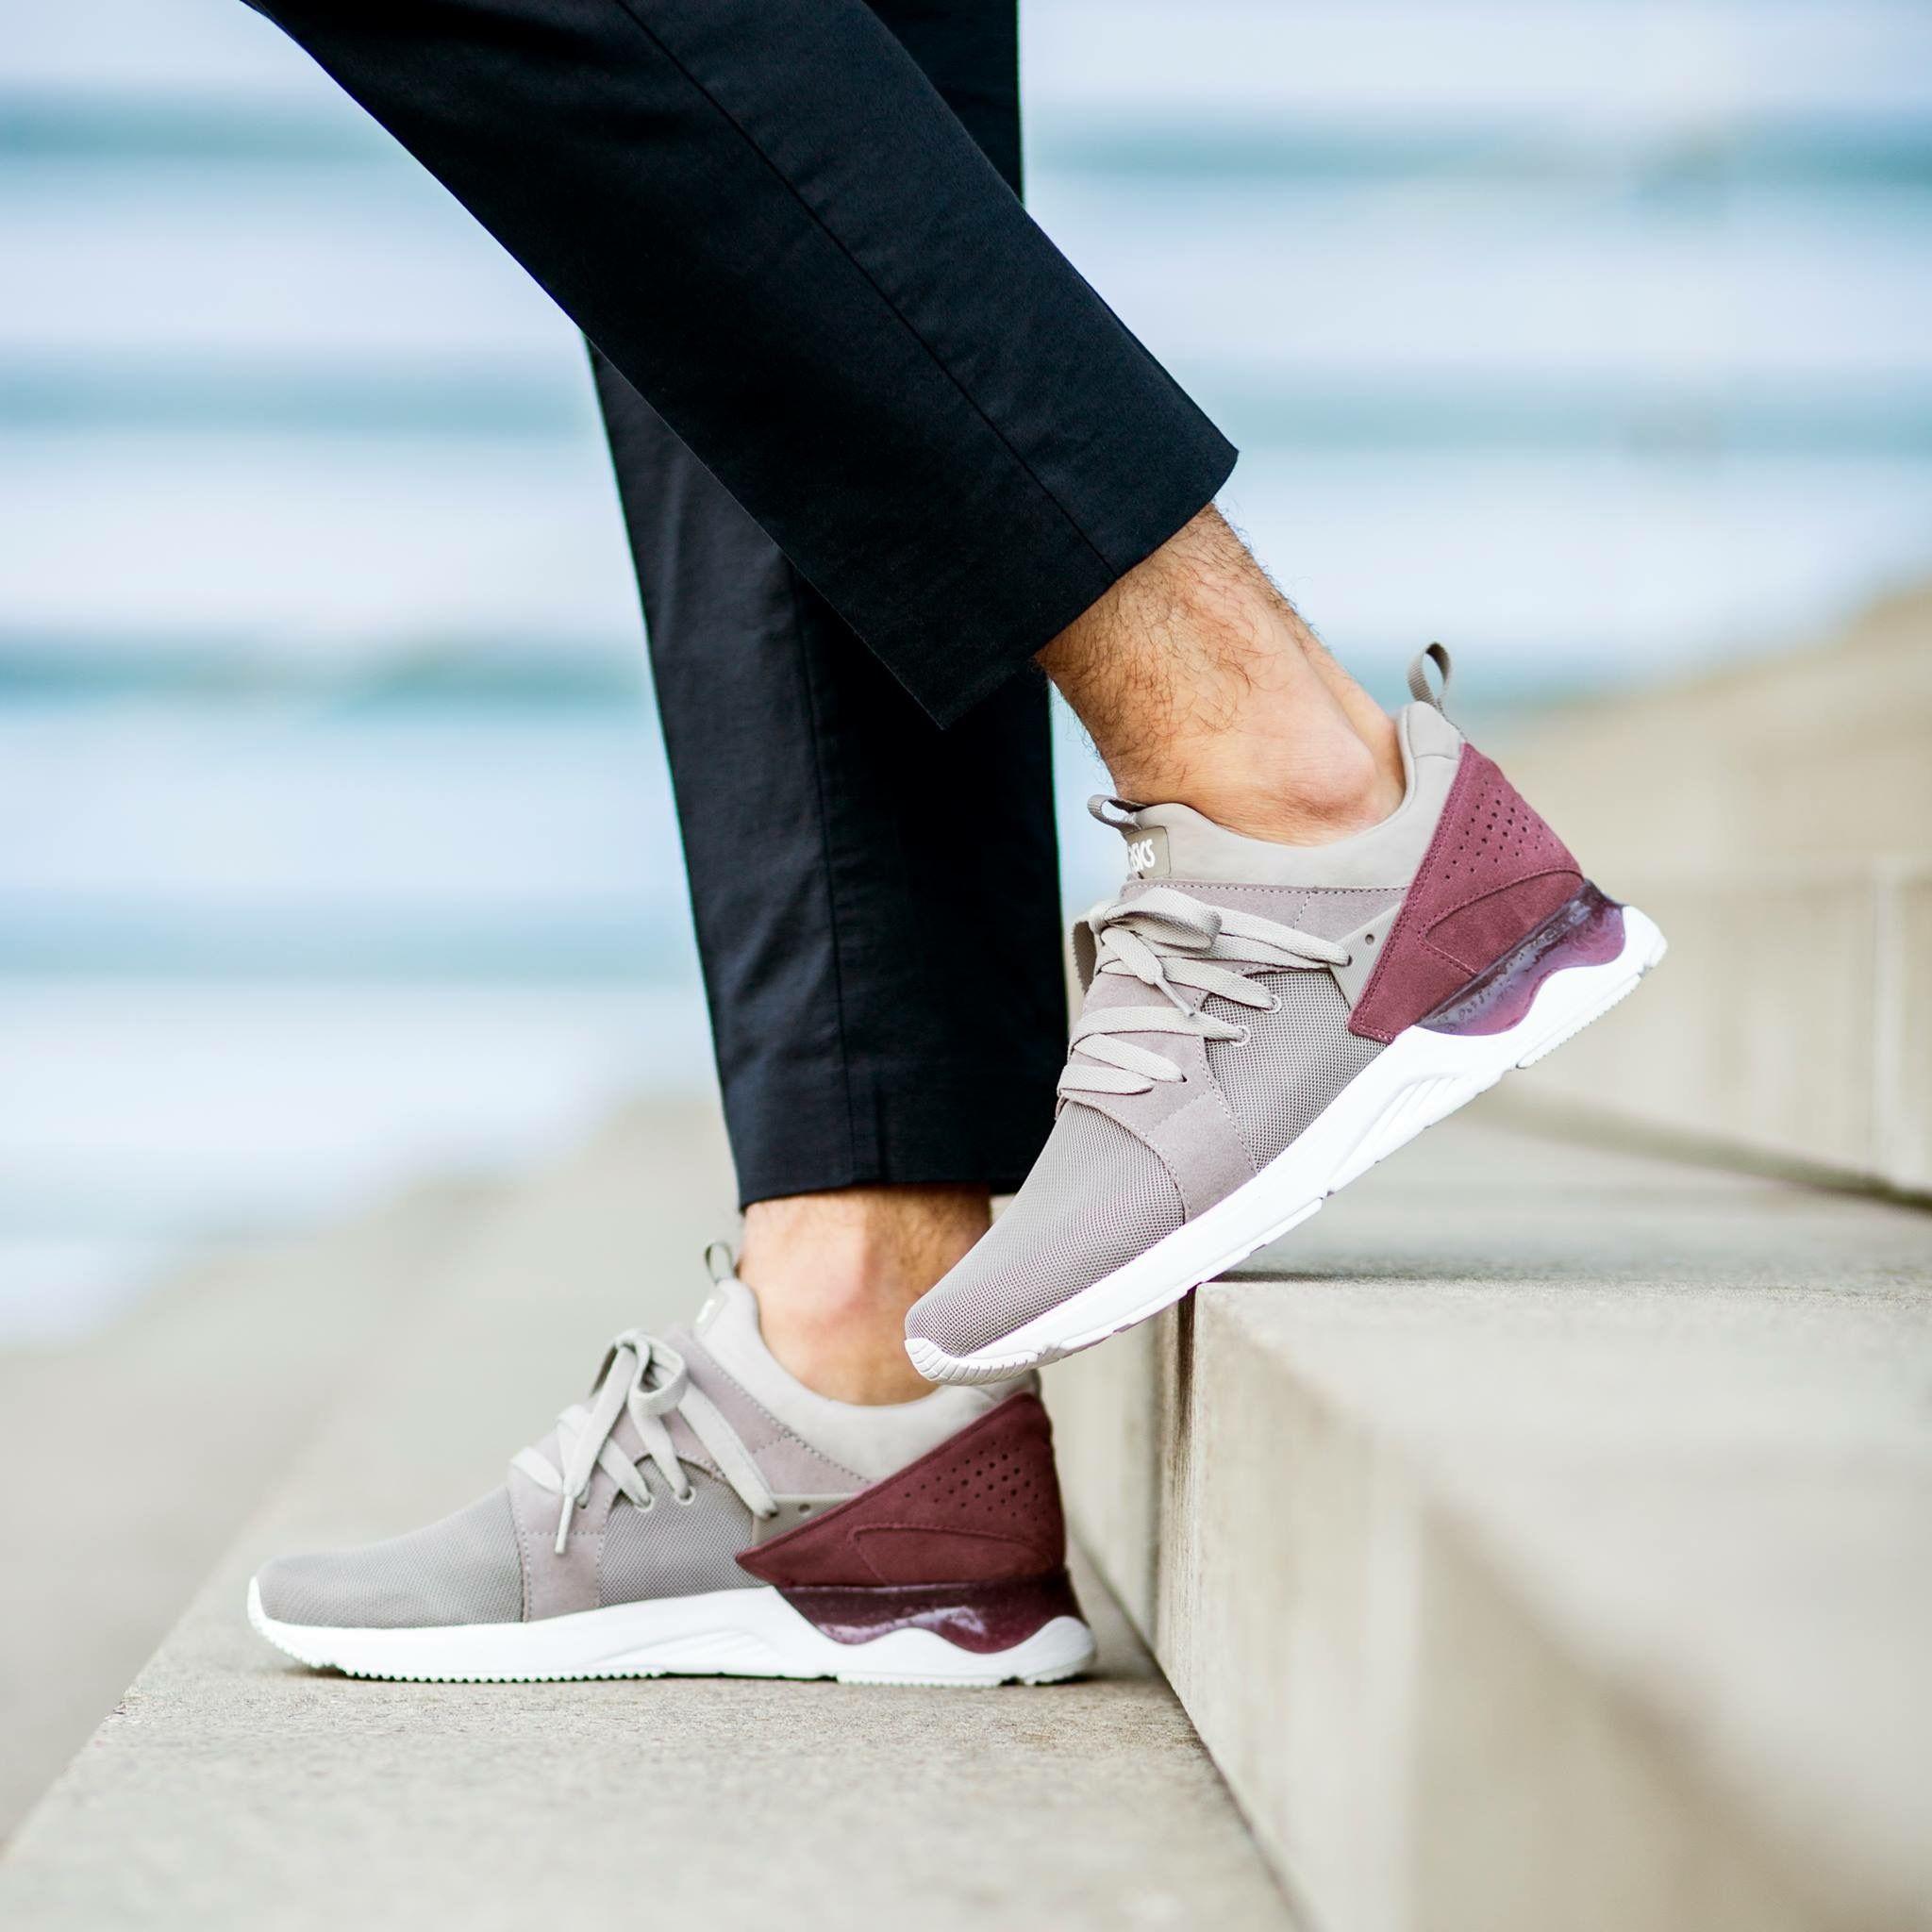 on sale 73b70 b03d7 Asics Gel Lyte V Sanze | 4YFeeT | Shoes, Sneakers, Asics shoes